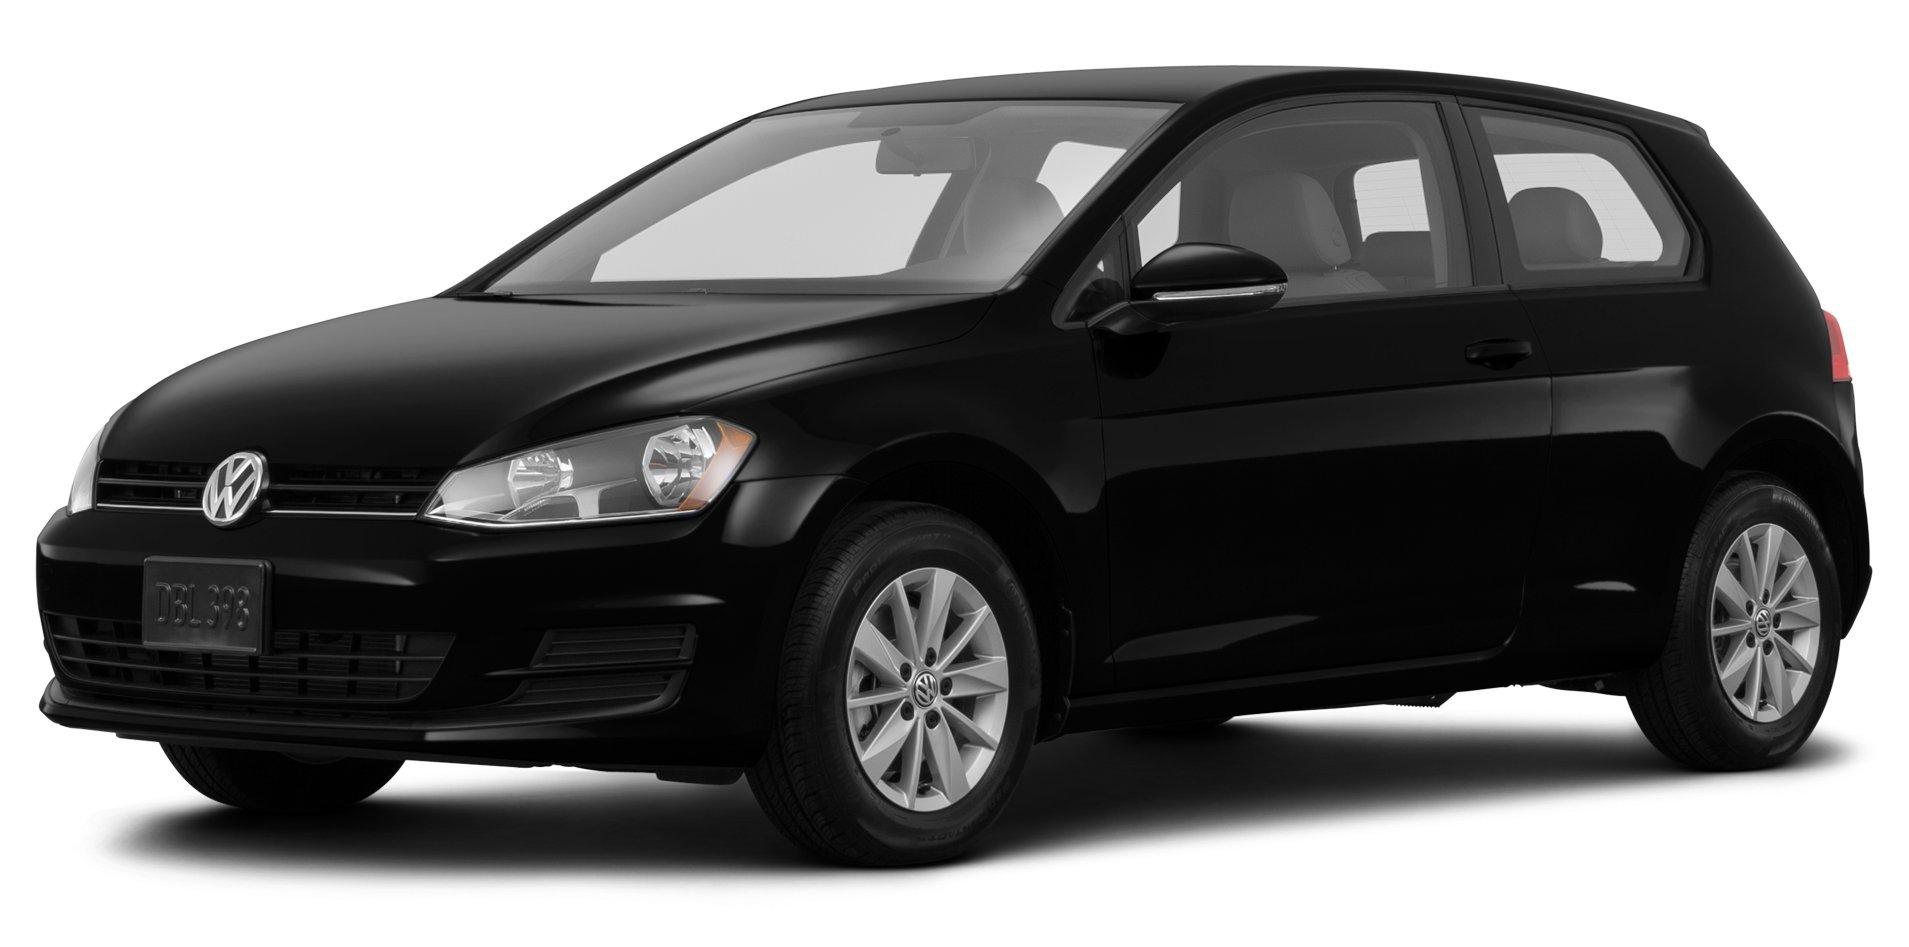 2015 volkswagen golf reviews images and specs vehicles. Black Bedroom Furniture Sets. Home Design Ideas